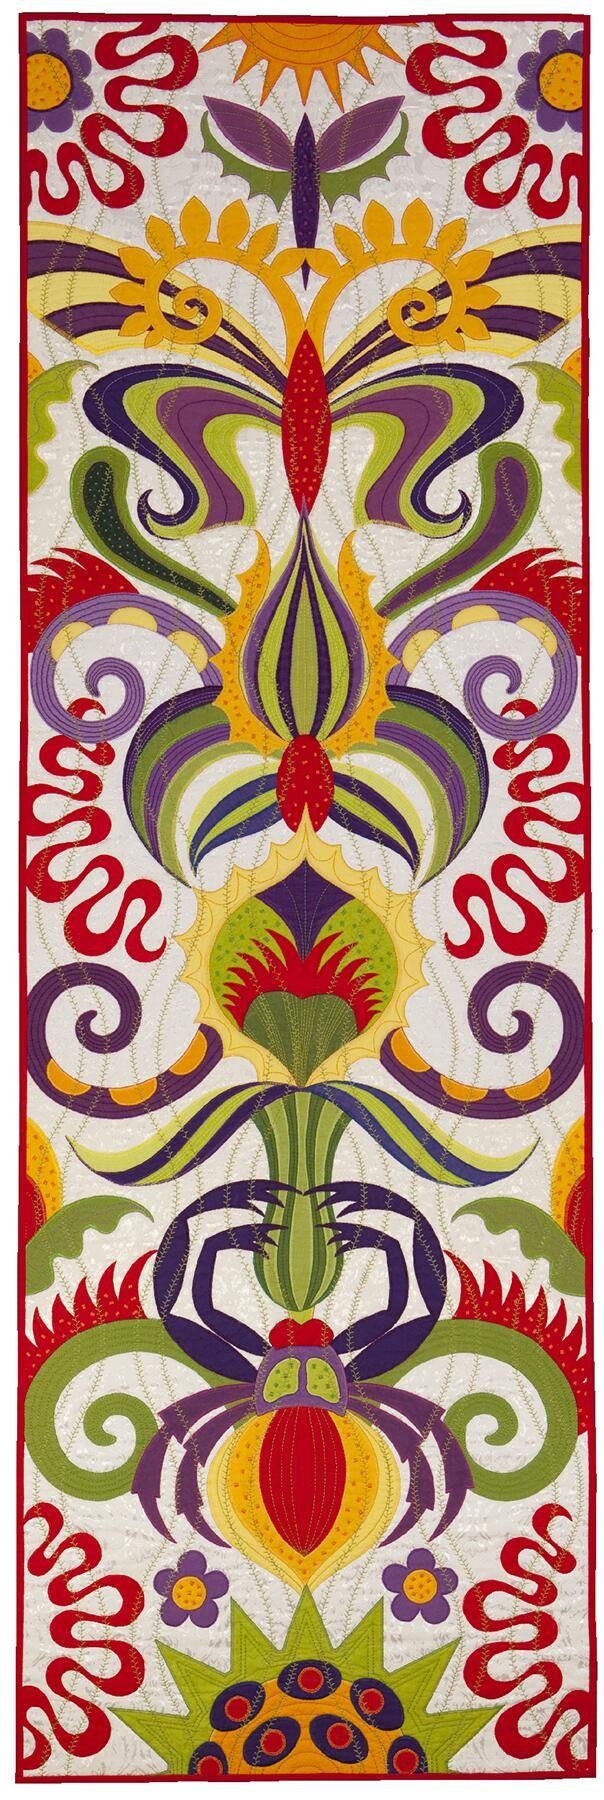 """Life Totem"" by Jane Sassaman | Chicago Quilt Festival"